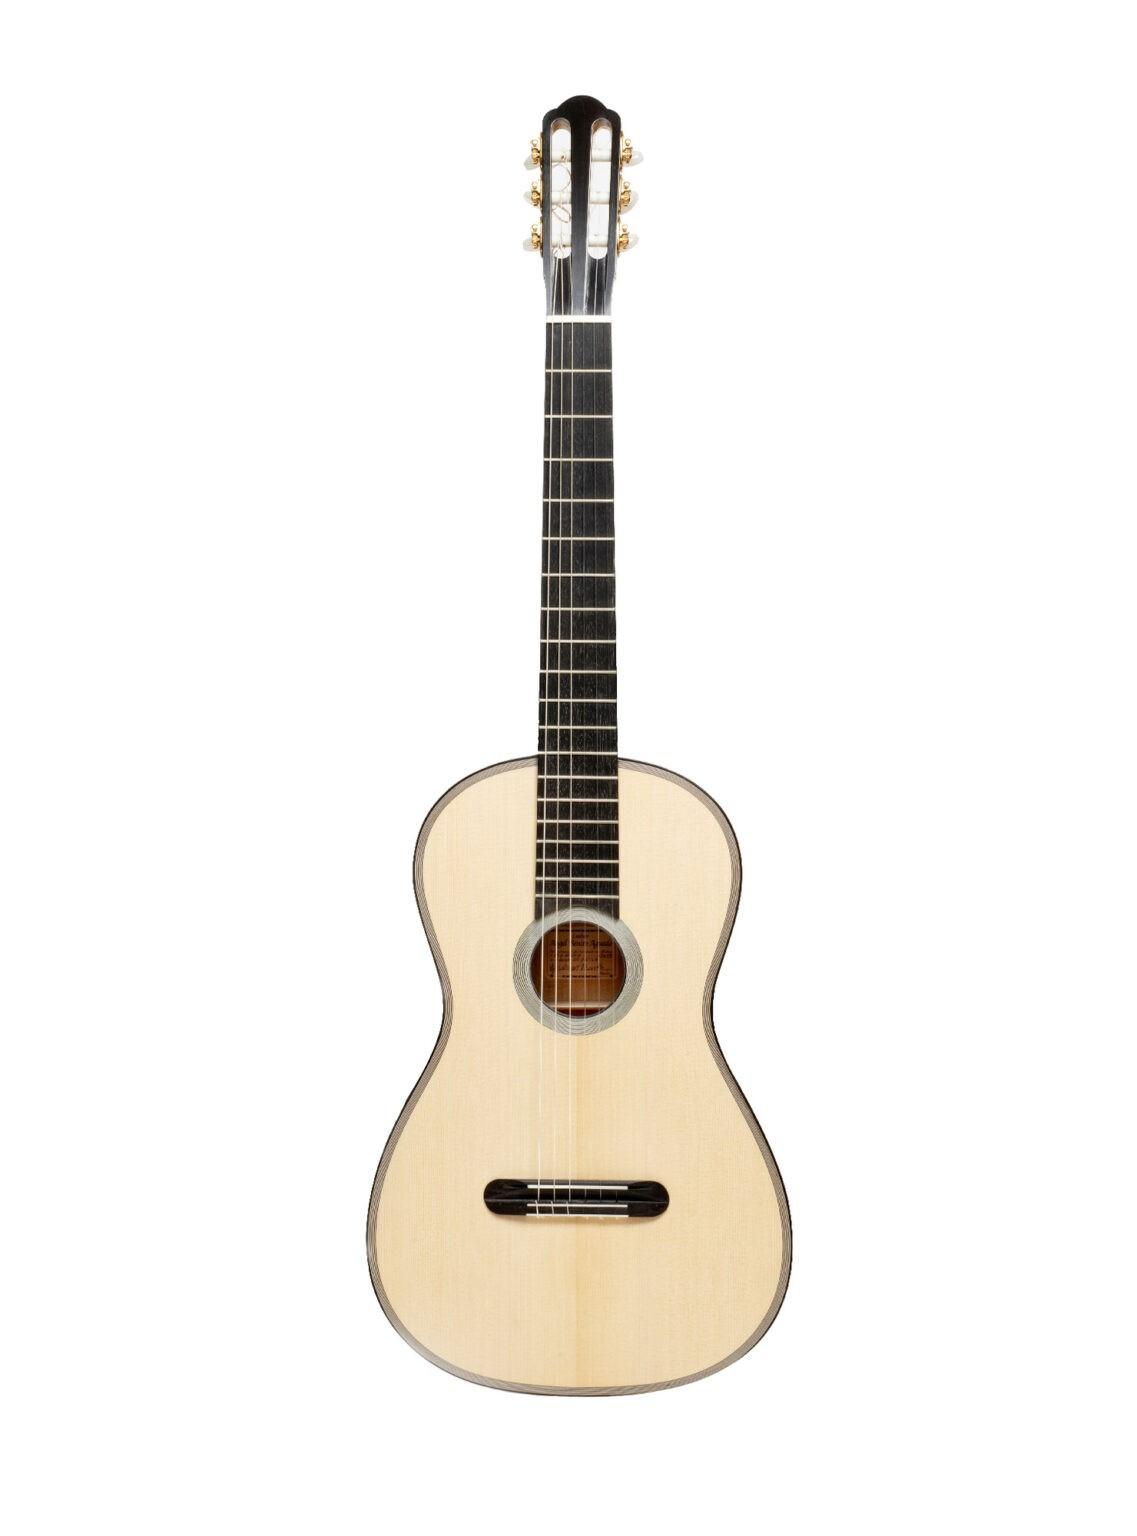 Guitarras de Angel Benito Aguado - Reproducciones de guitarras históricas - Lacôte (modelo Dionisio Aguado)